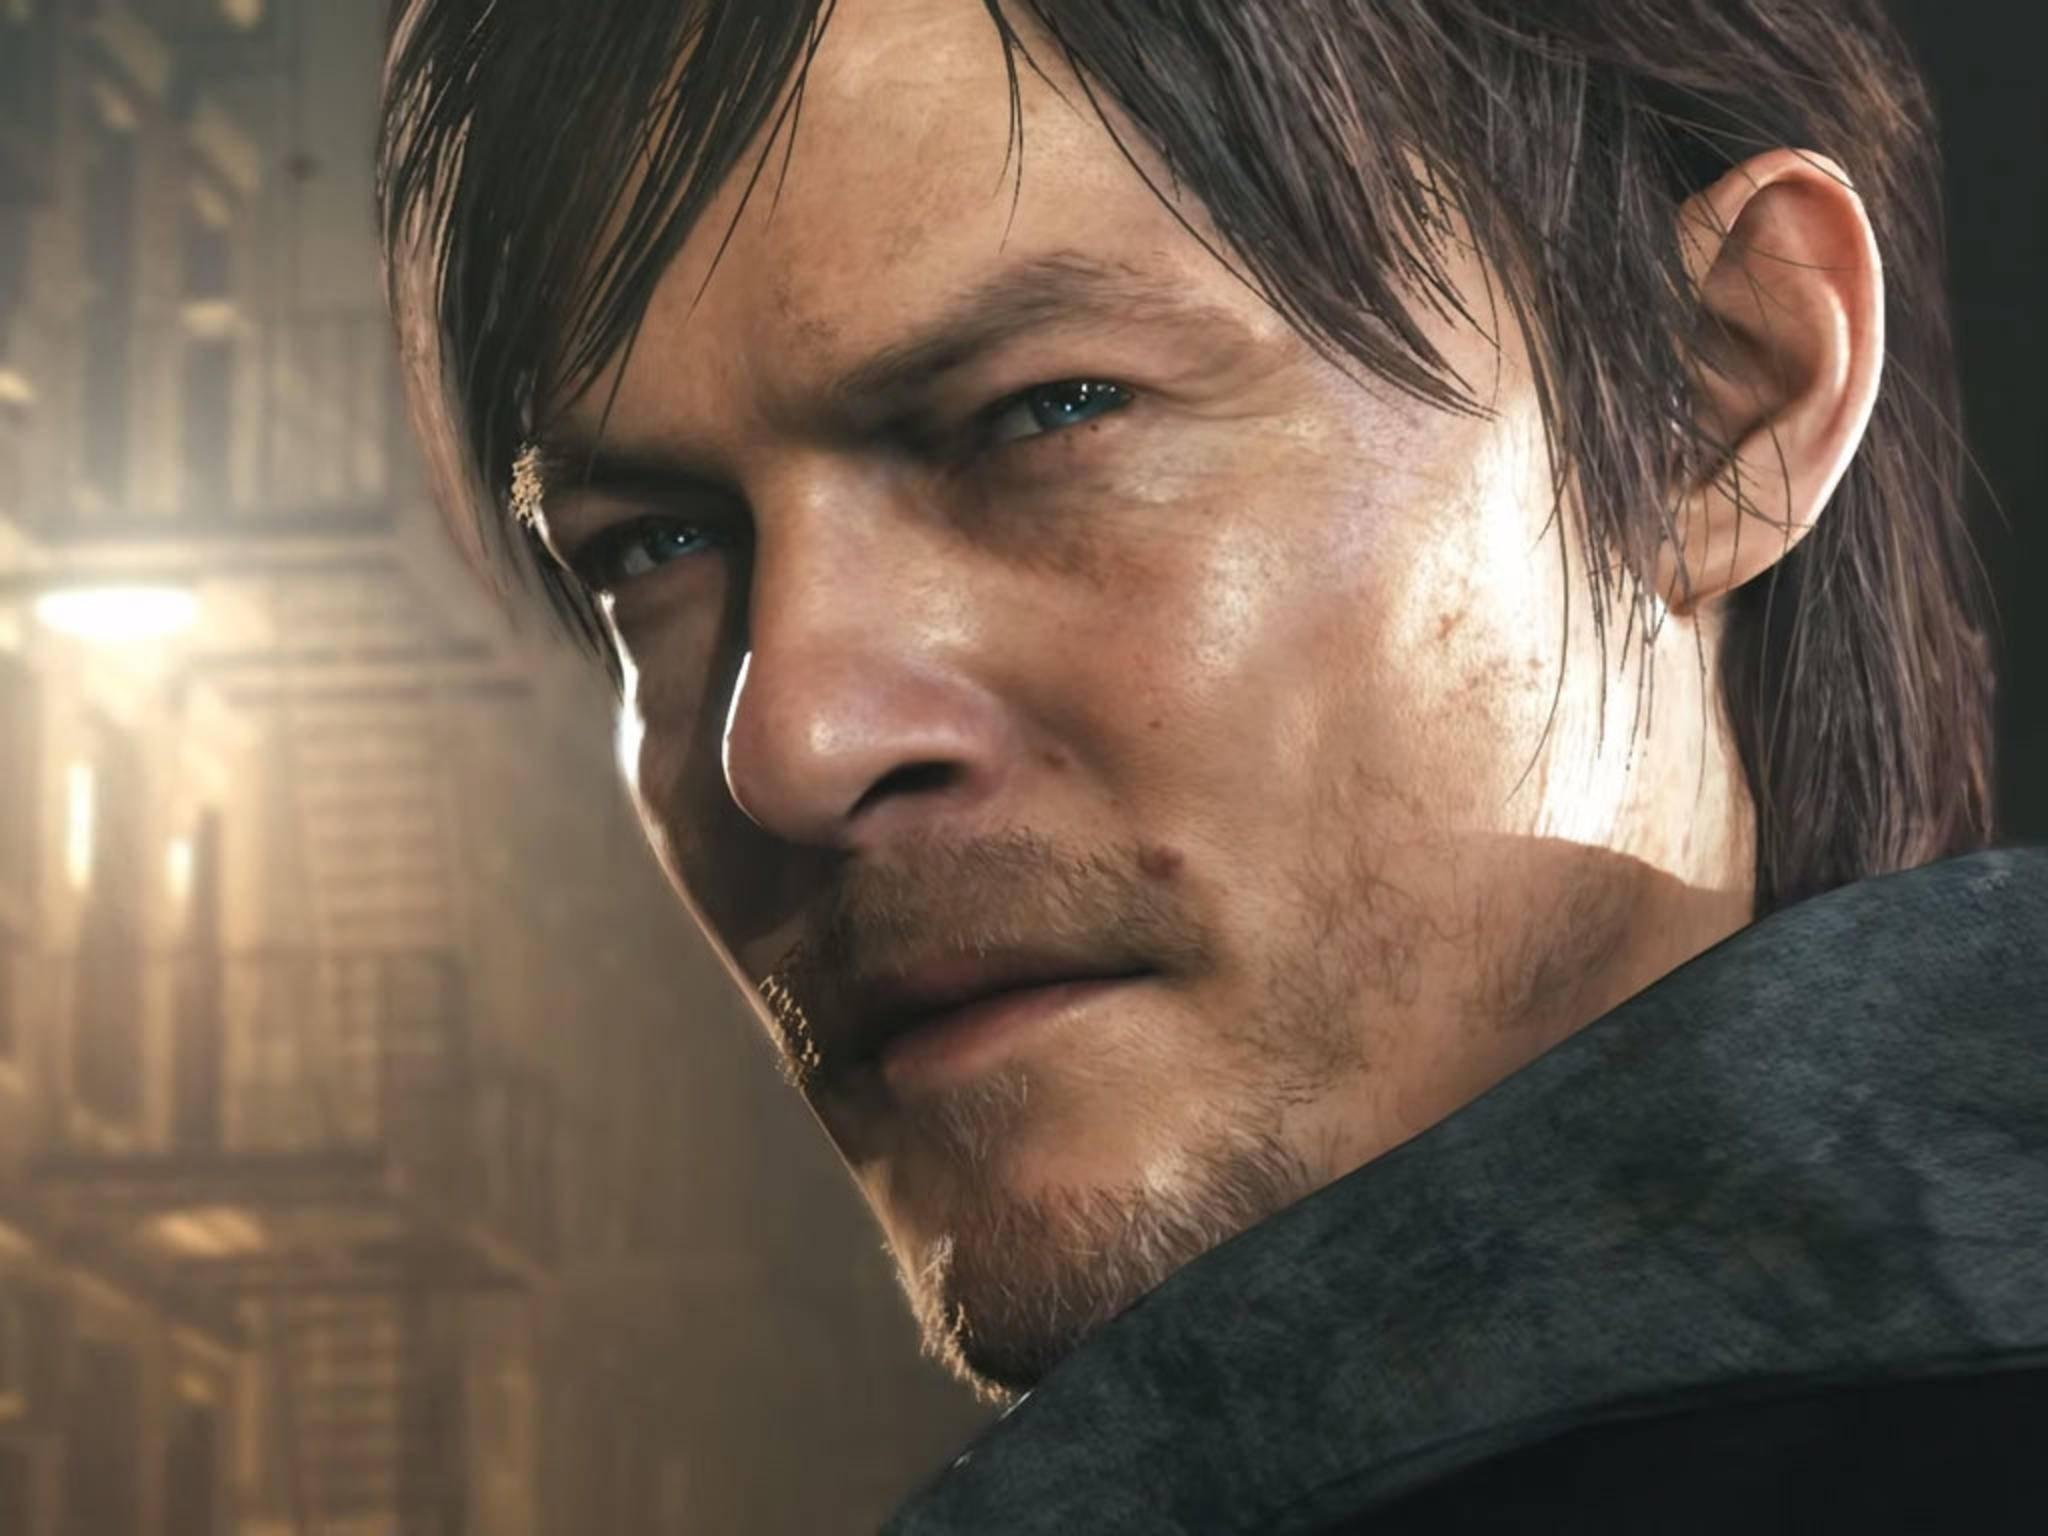 Walking-Dead-Star Norman Reedus sollte der Held in Silent Hills werden.